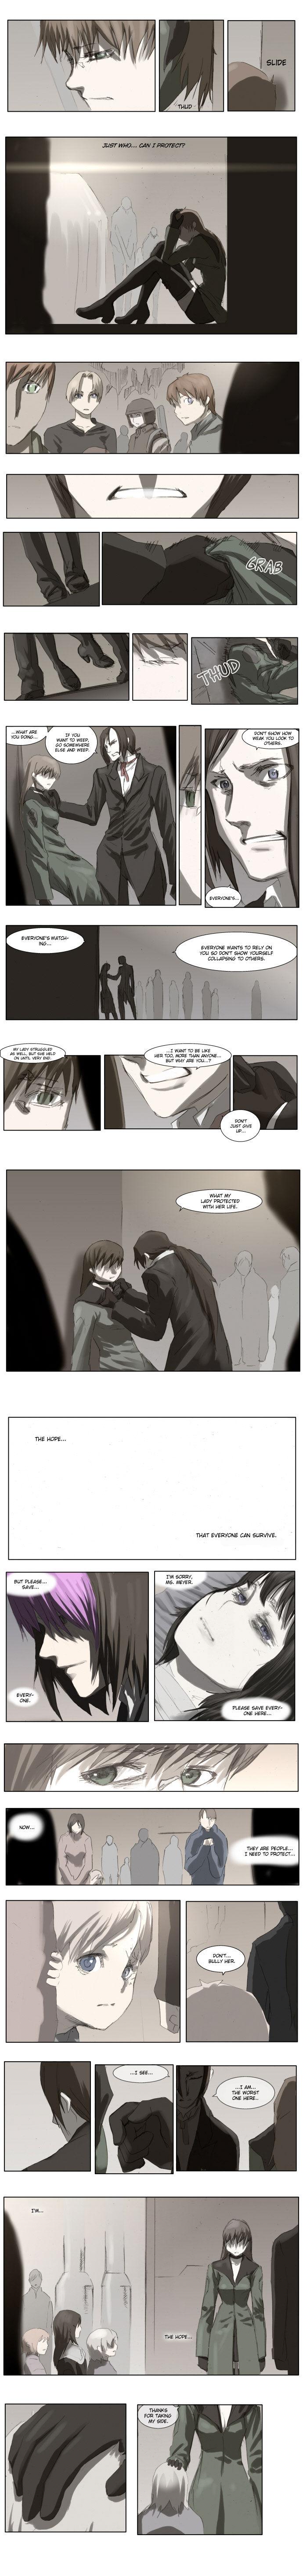 Knight Run 44 Page 1